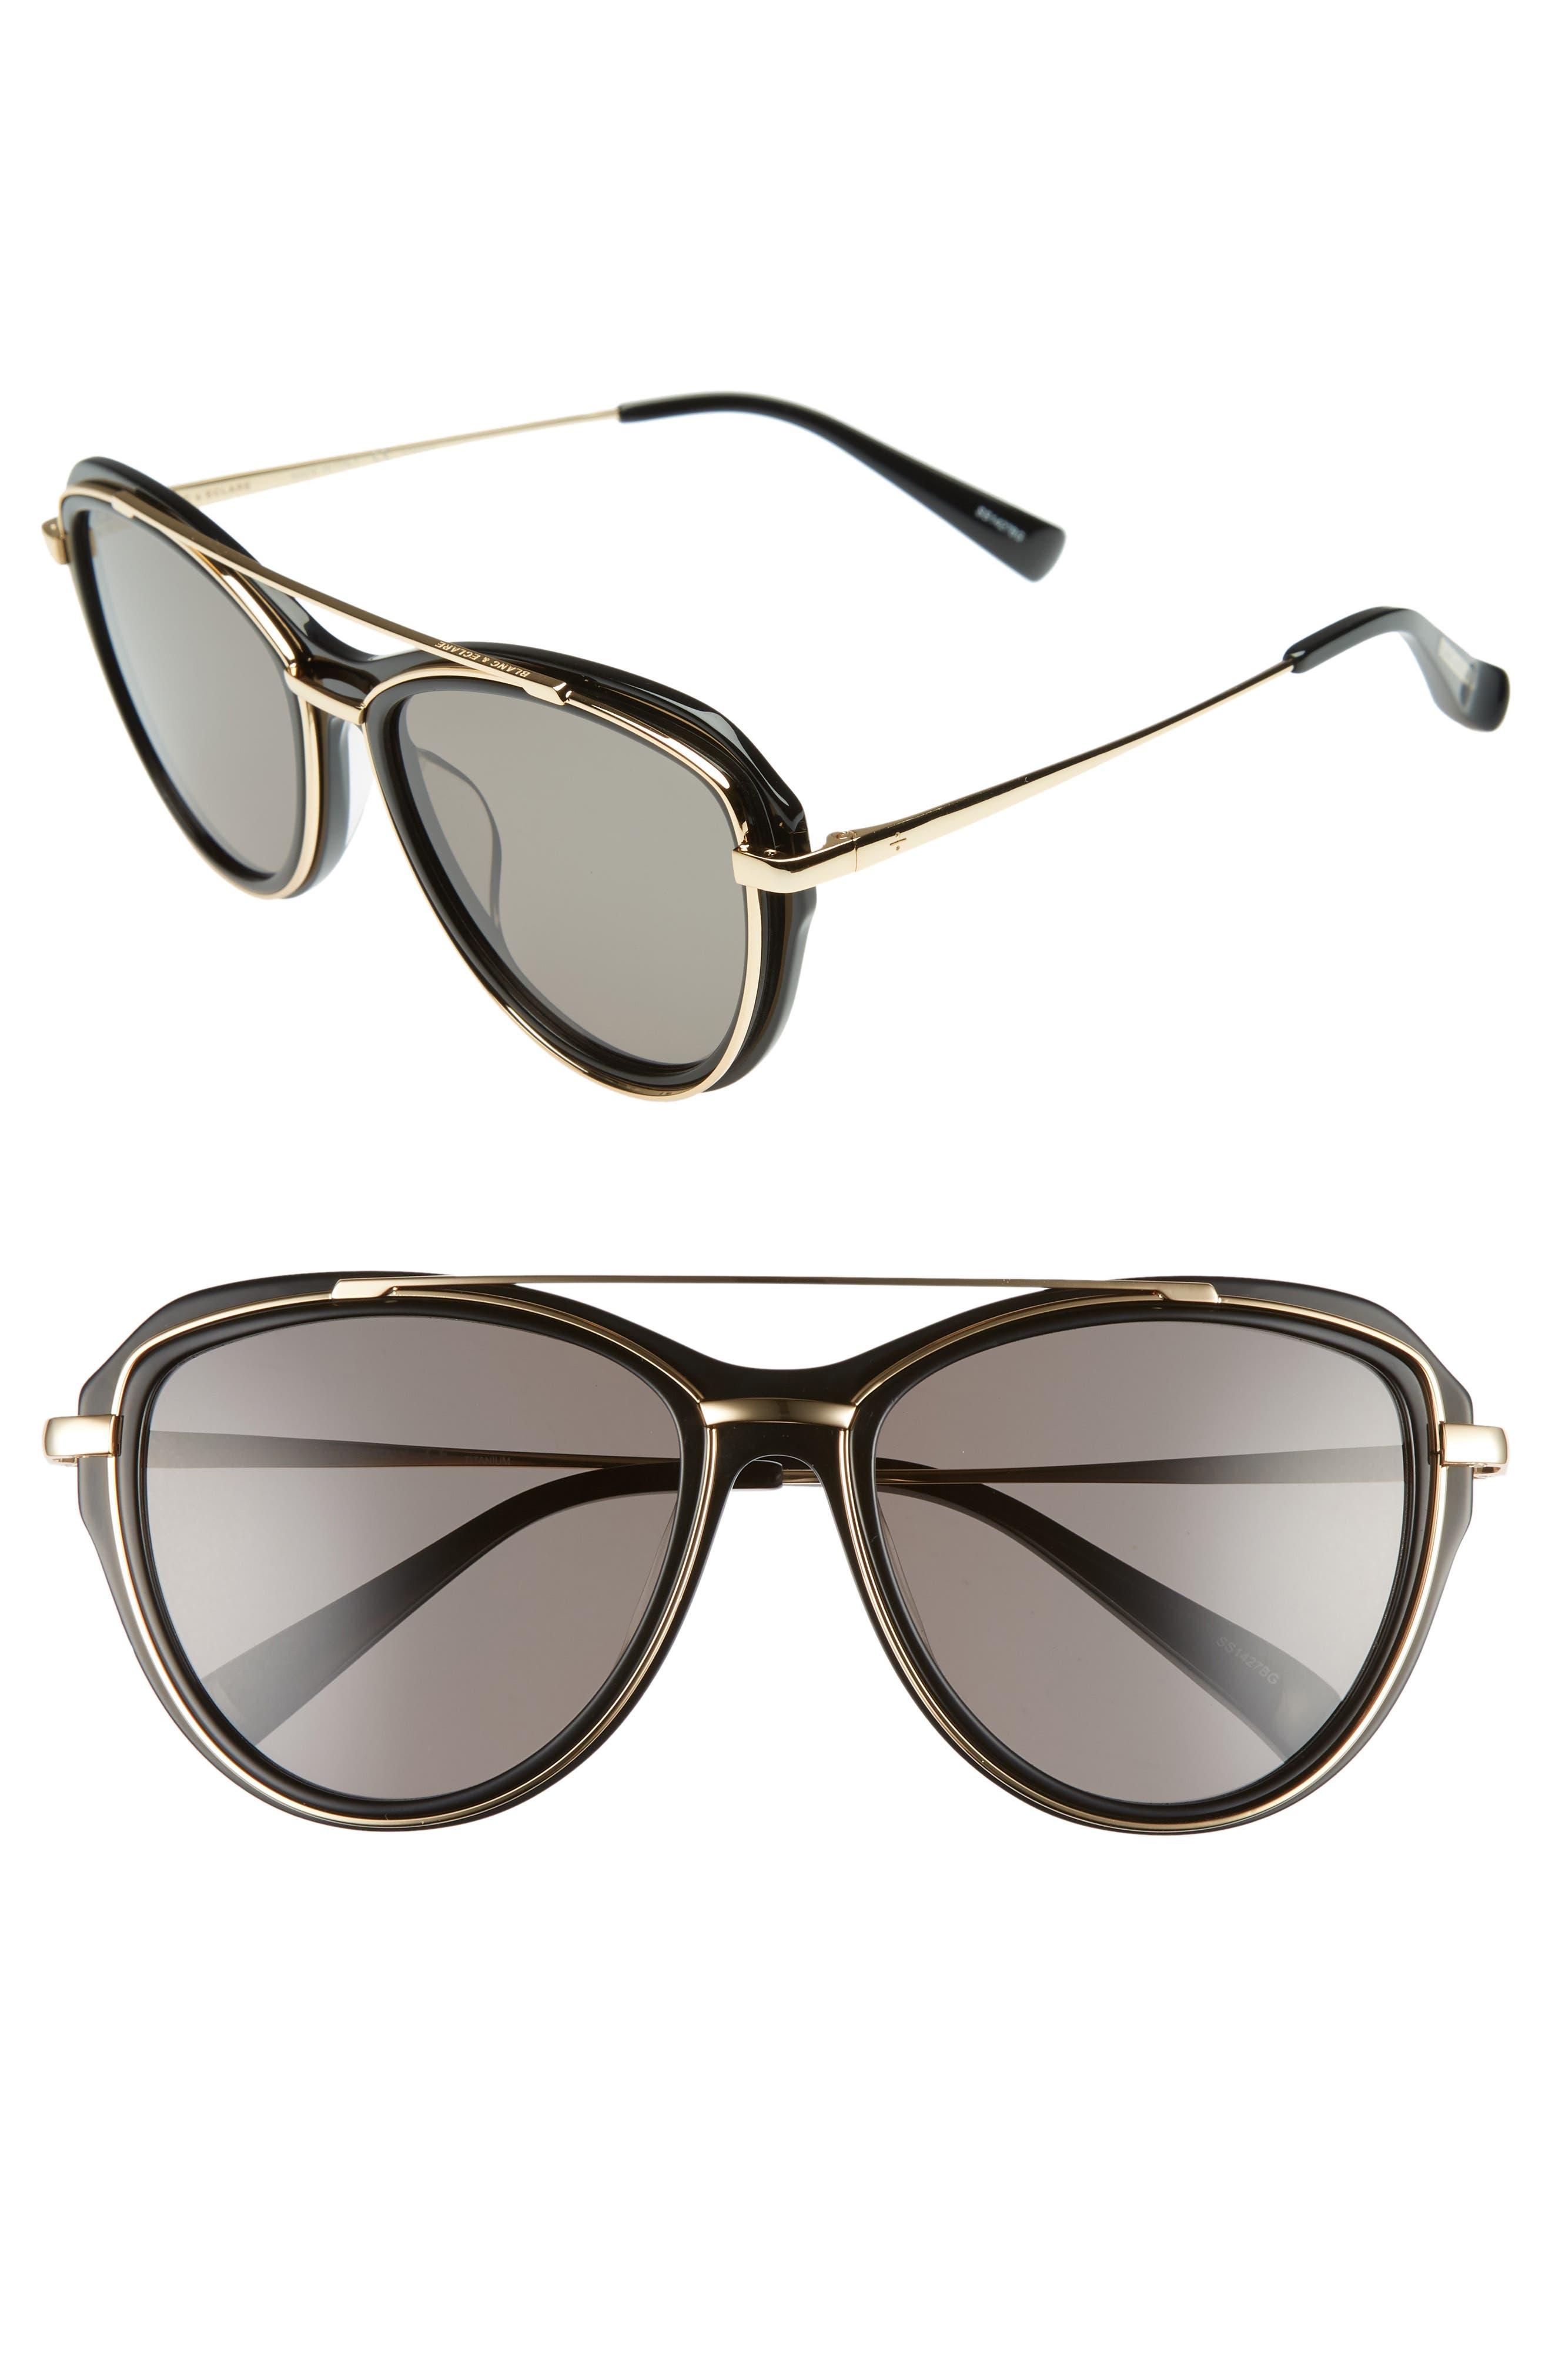 BLANC & ECLARE Marrakesh 57mm Aviator Sunglasses,                         Main,                         color, Black/ Gold/ Smog Grey